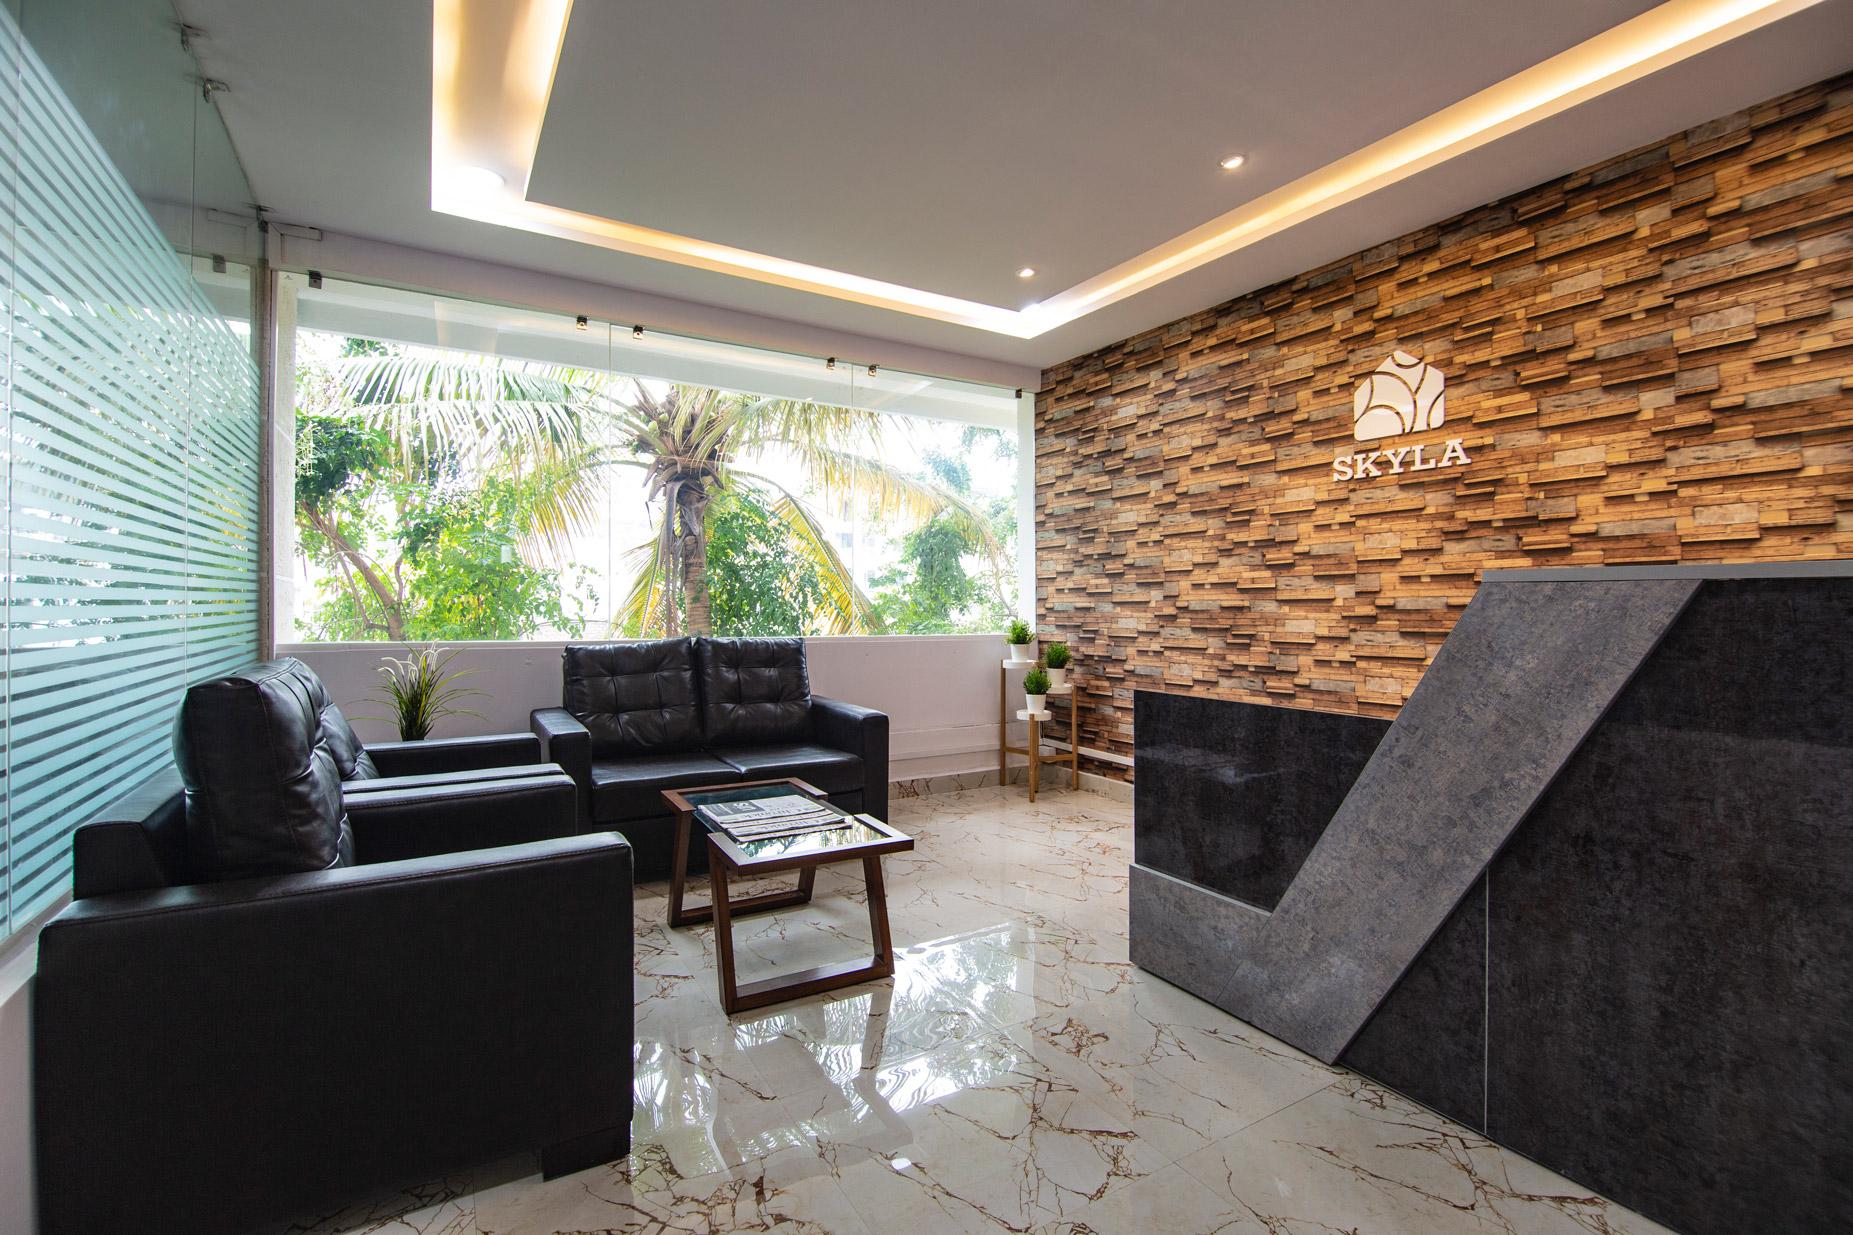 skyla-service-apartment-hyderabad-banjara-hills-bluefox-restaurant-3bhk10.jpg